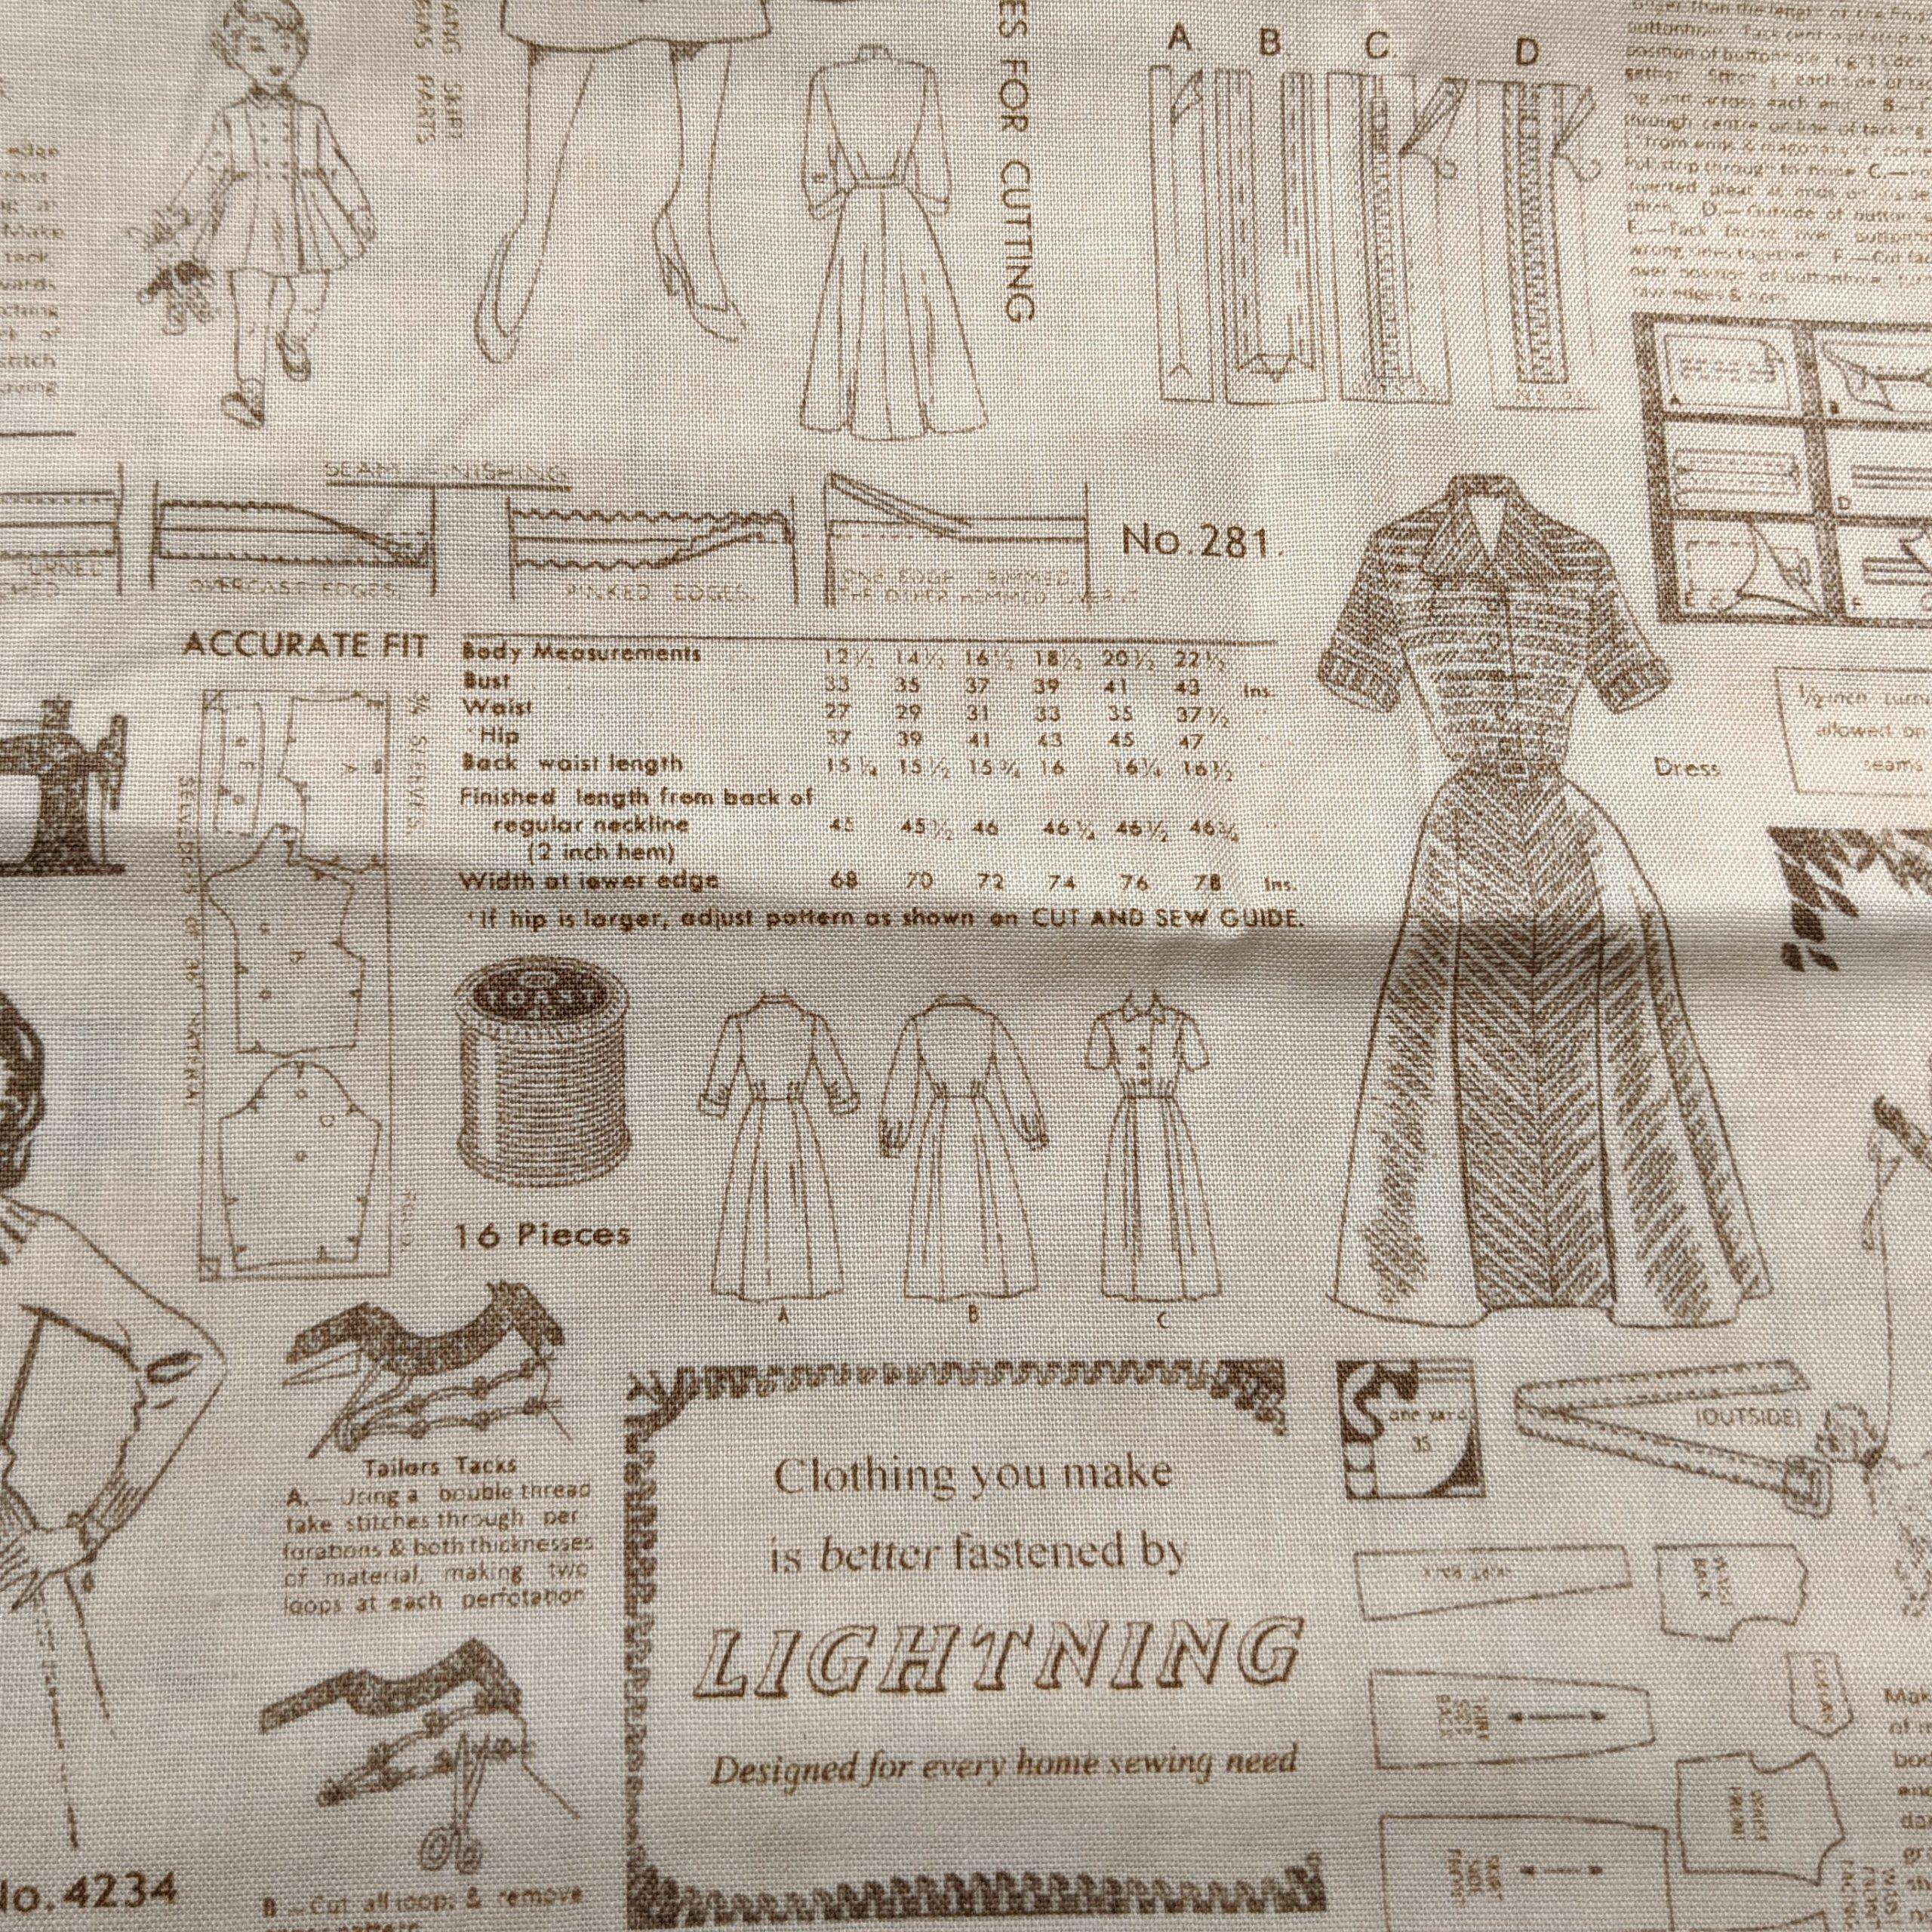 Dressingmaking